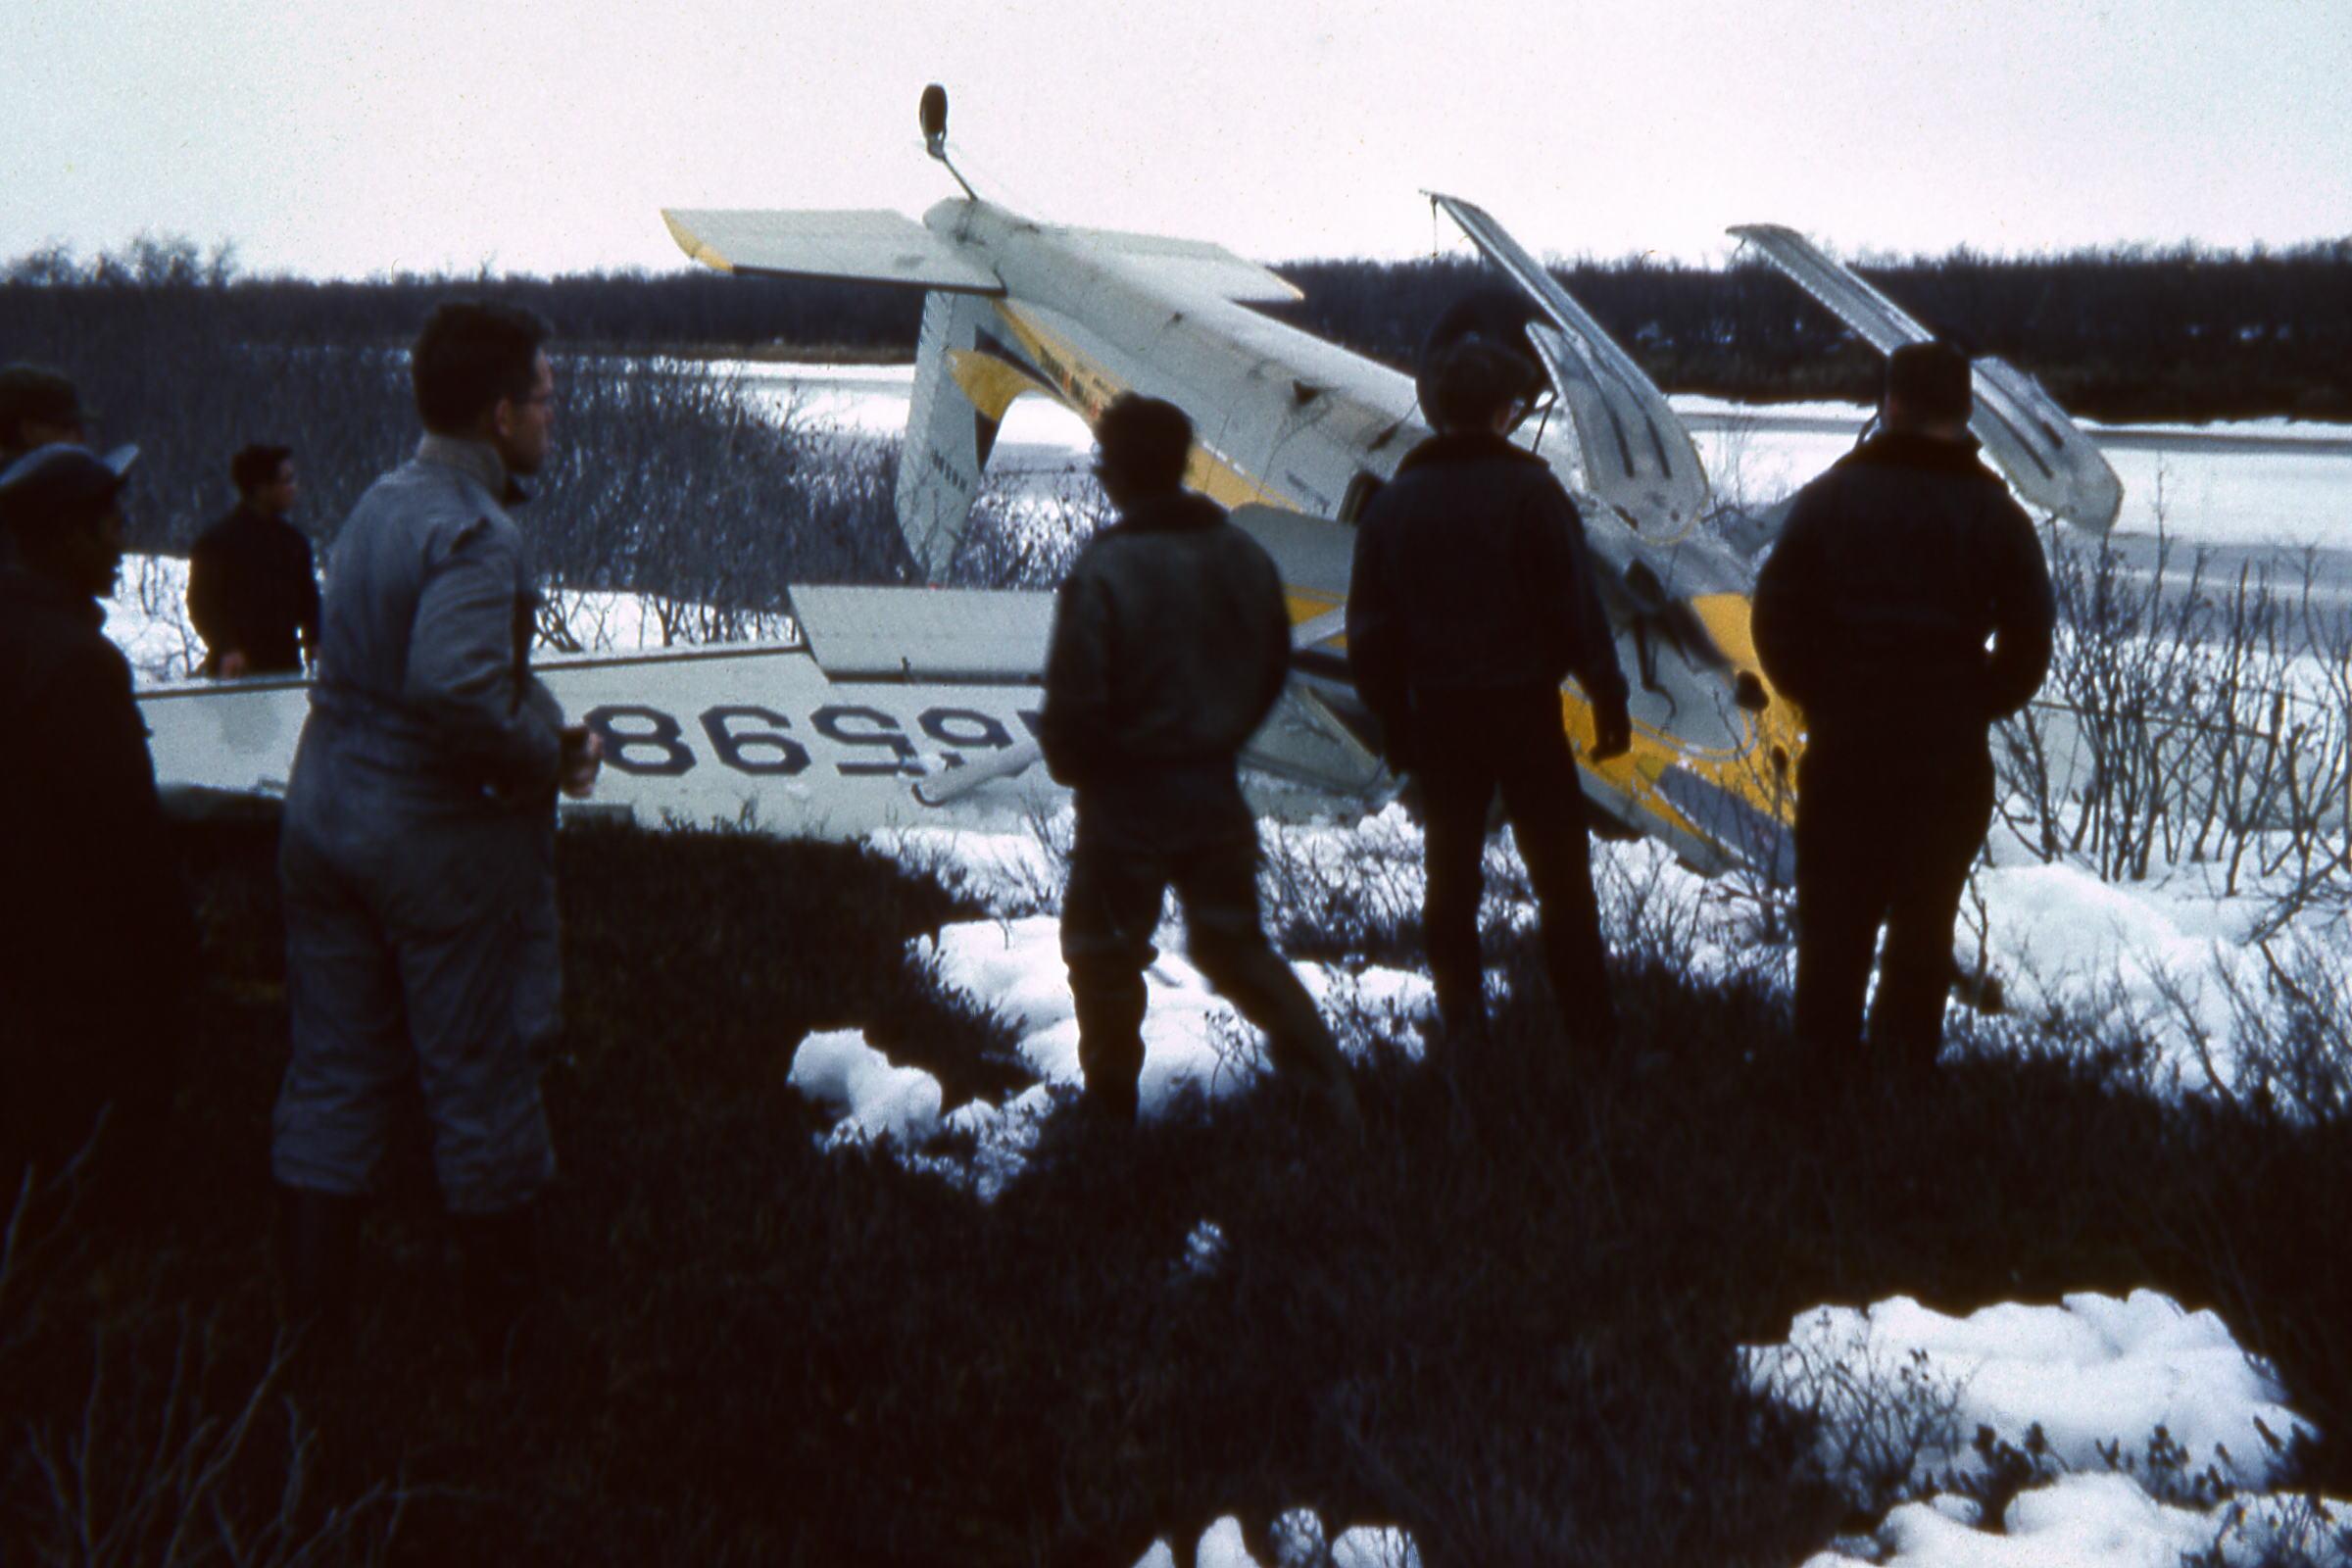 1964 Ketchum Air accident